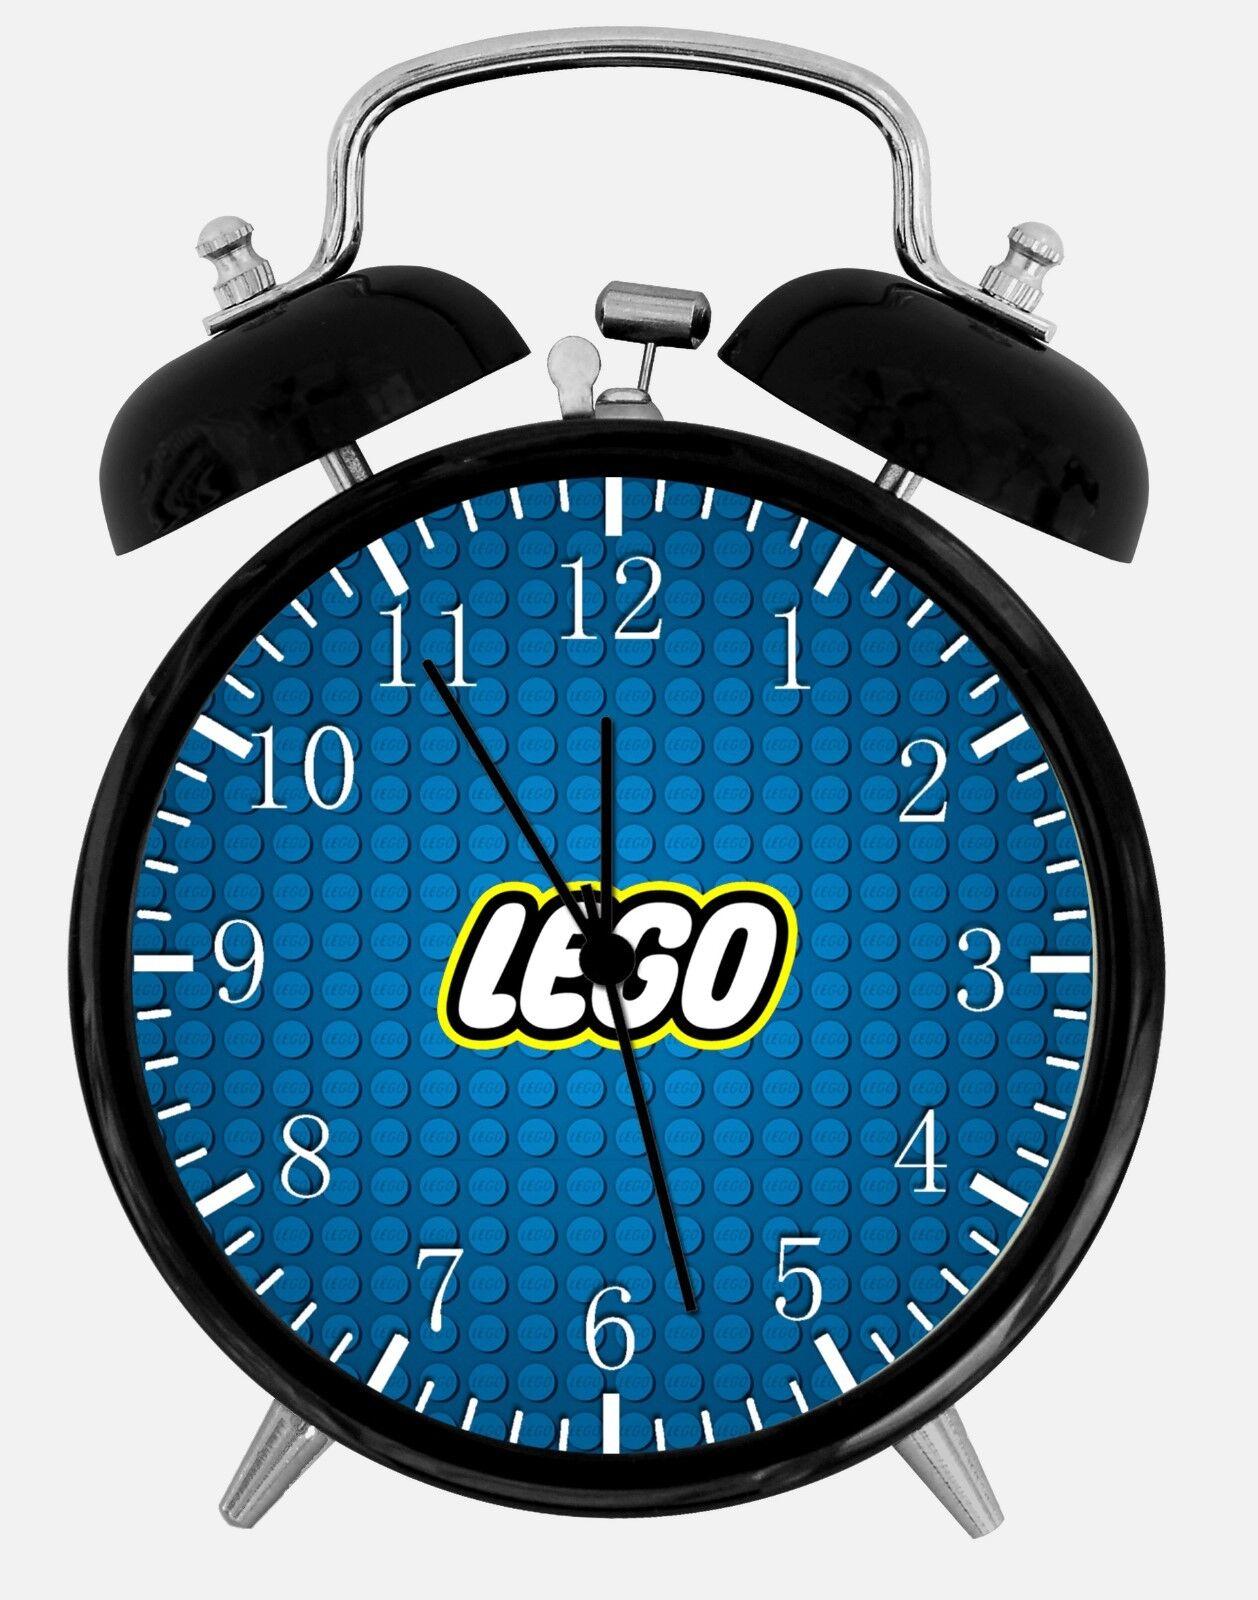 "Lego Bricks Alarm Desk Clock 3.75"" Home or Office Decor W458 Nice For Gift"